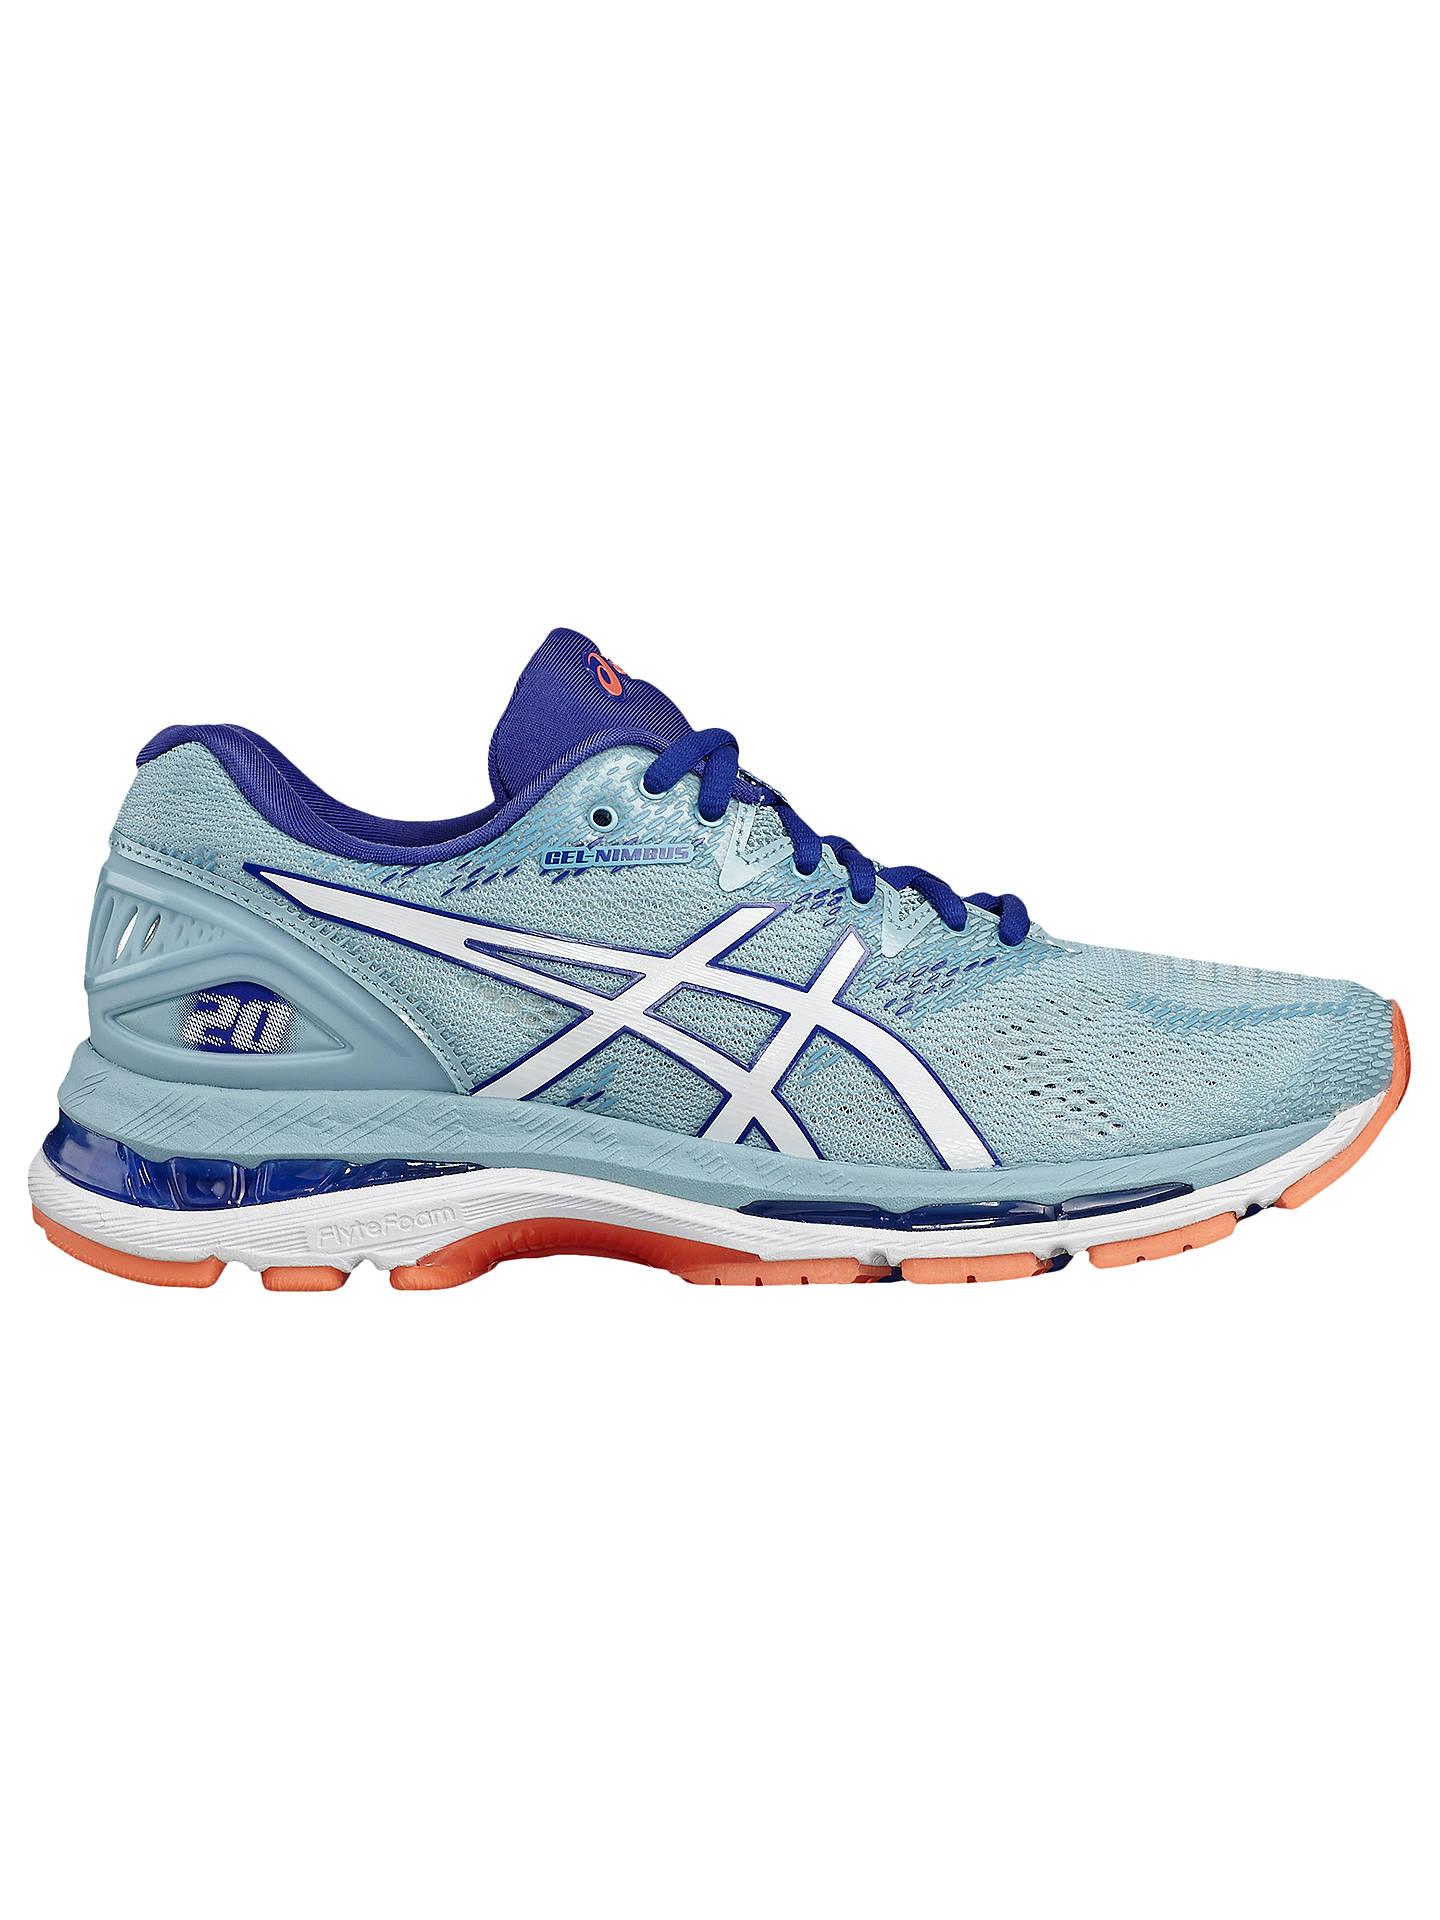 12e2ddcf774 Buy Asics GEL-NIMBUS 20 Women s Running Shoes